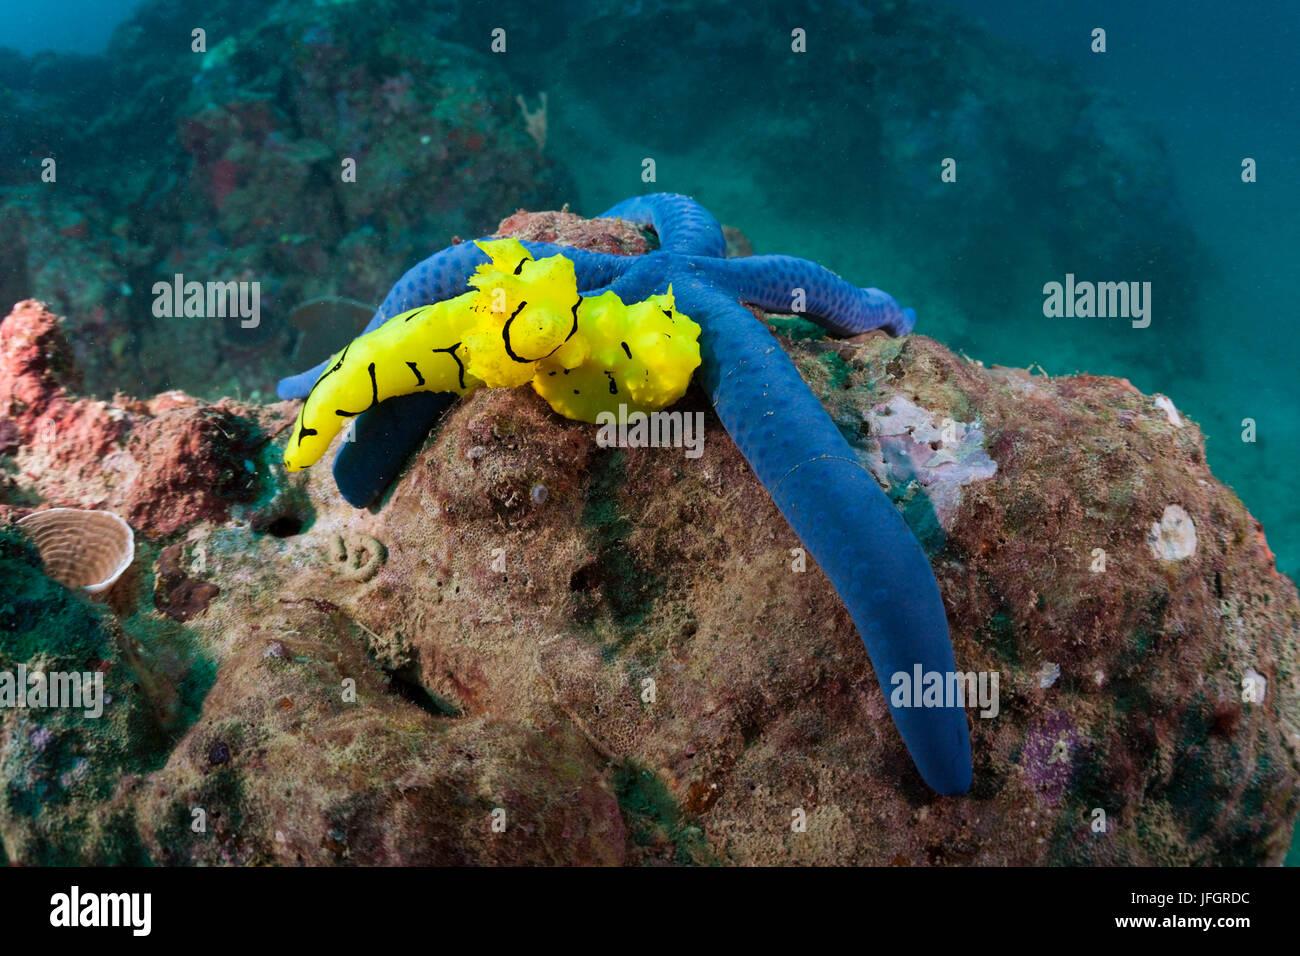 Gelbe Variable Neon Schnecke am Seestern, Notodoris minor, Florida Inseln, Salomonen Stockbild